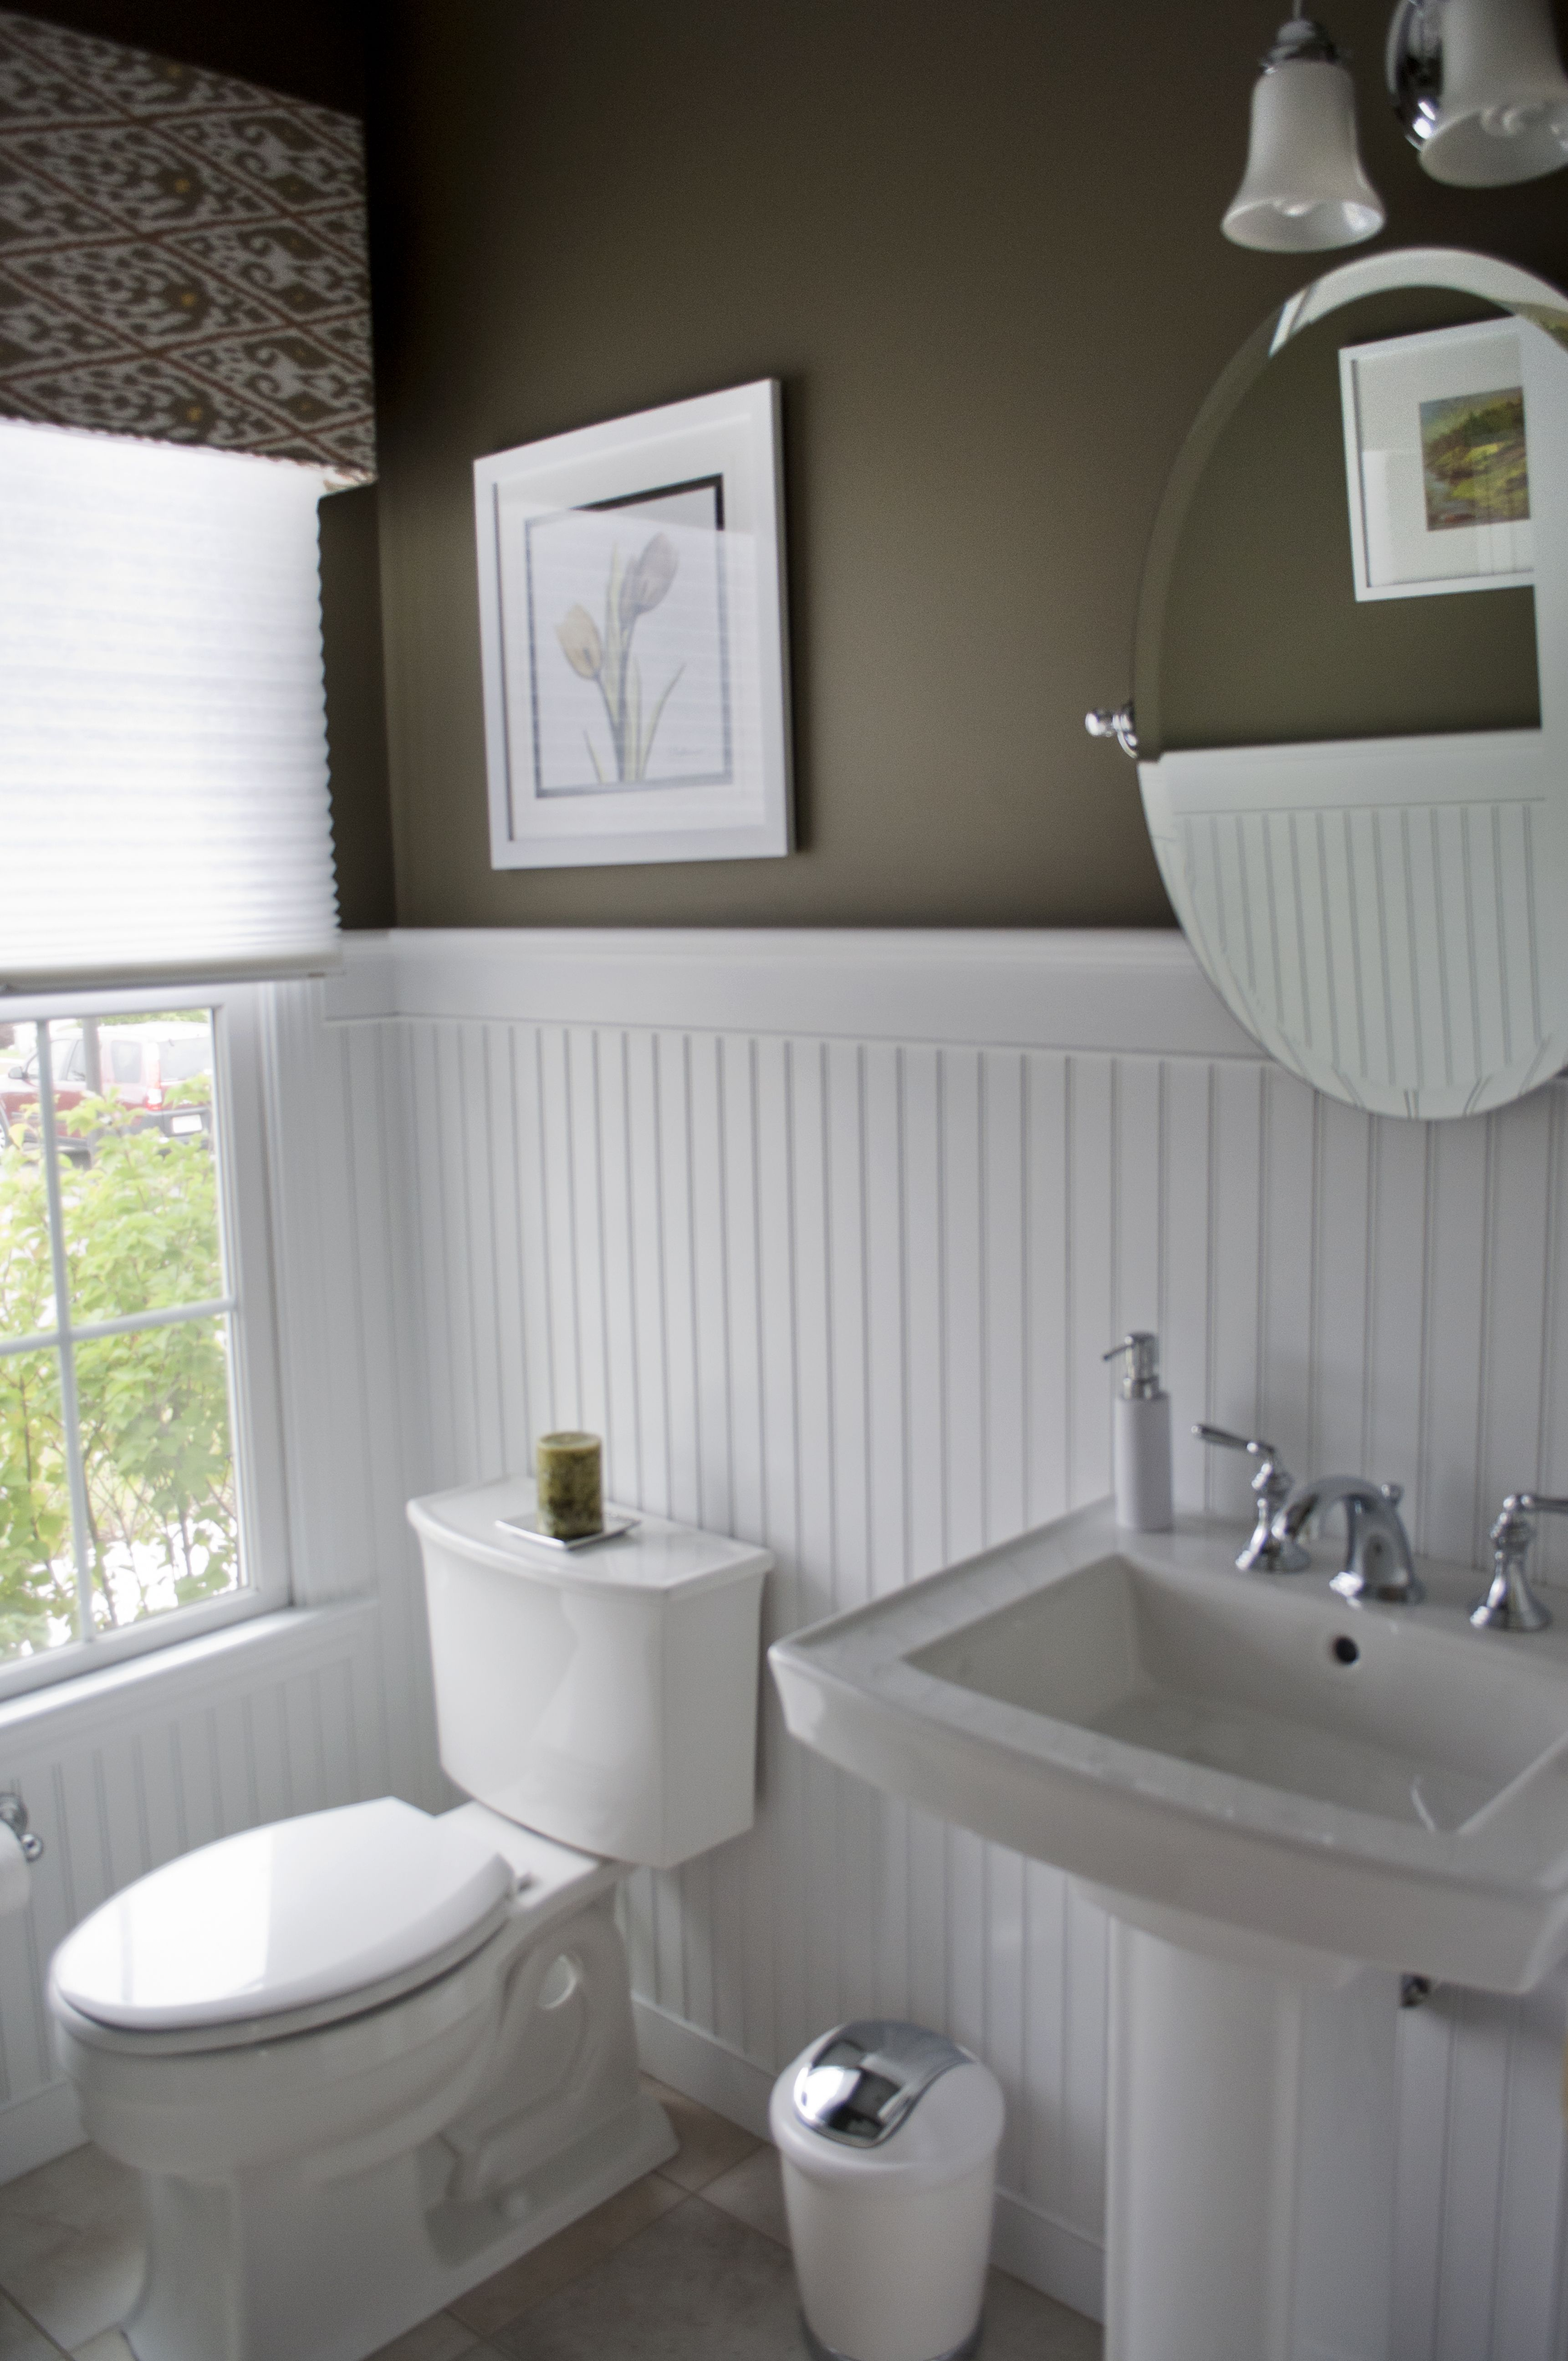 How High Should Beadboard Be In Bathroom - Bathroom Design ...